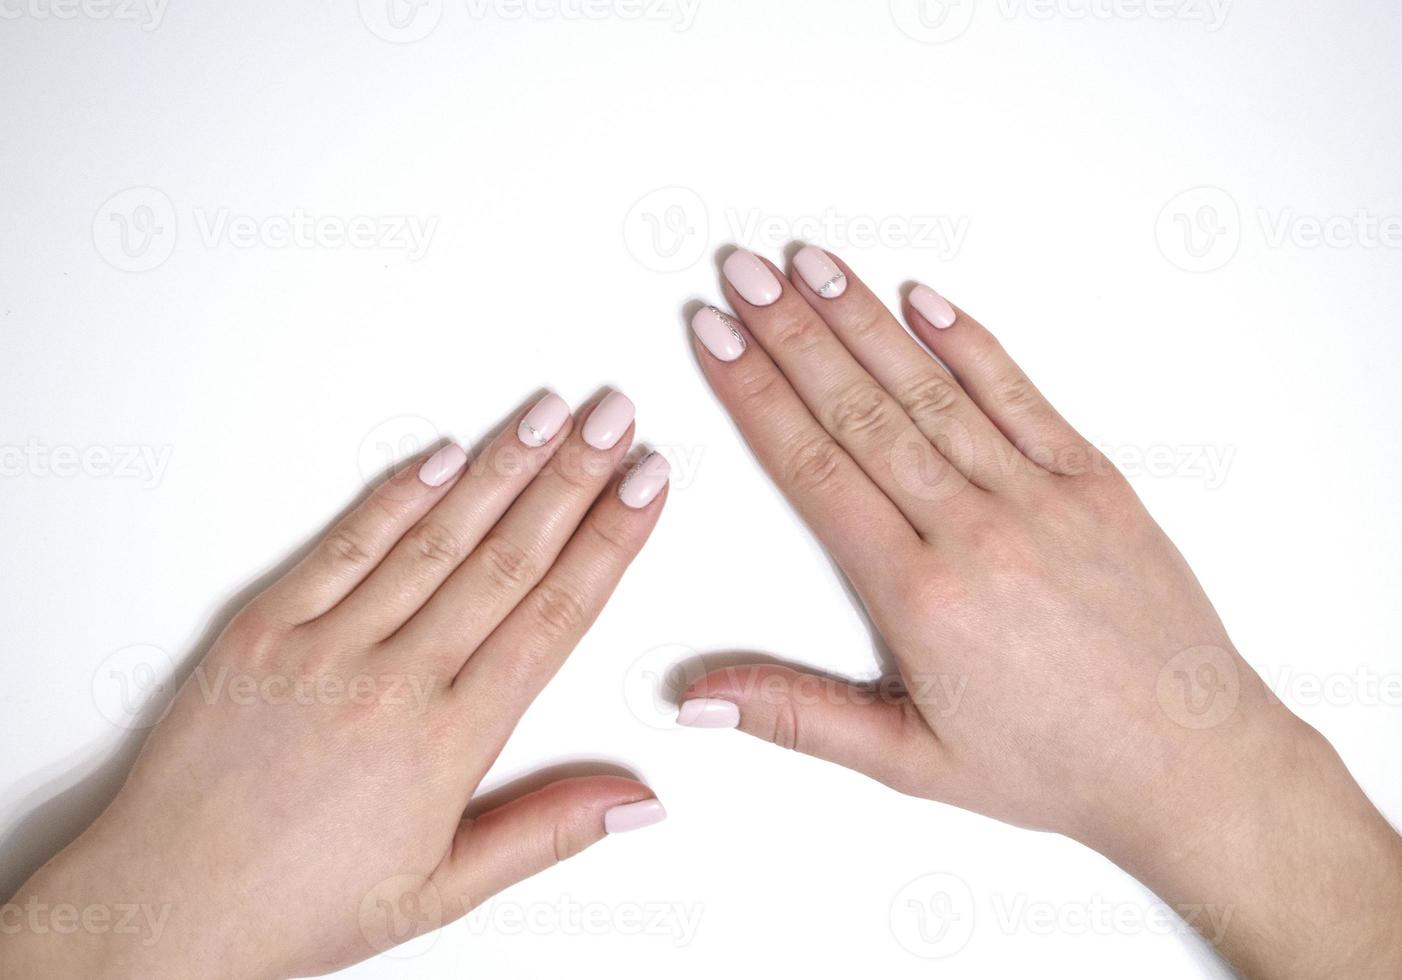 manicura femenina sobre un fondo blanco. sencillo foto